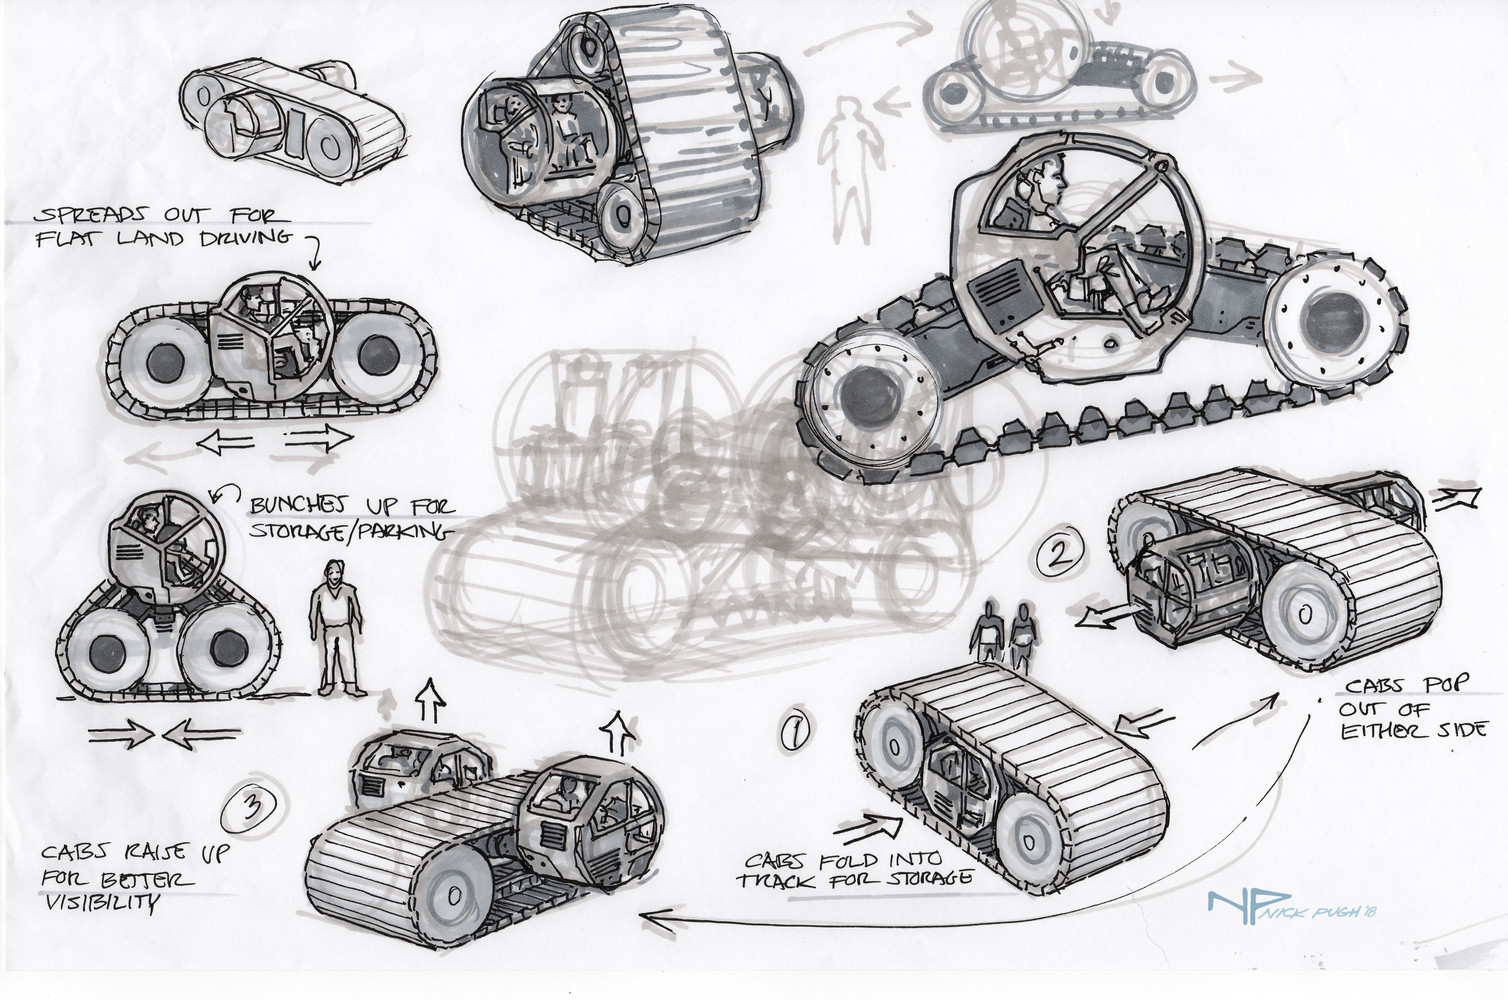 TRX_180205_0000_Set_RockCrawler1_Sketch_